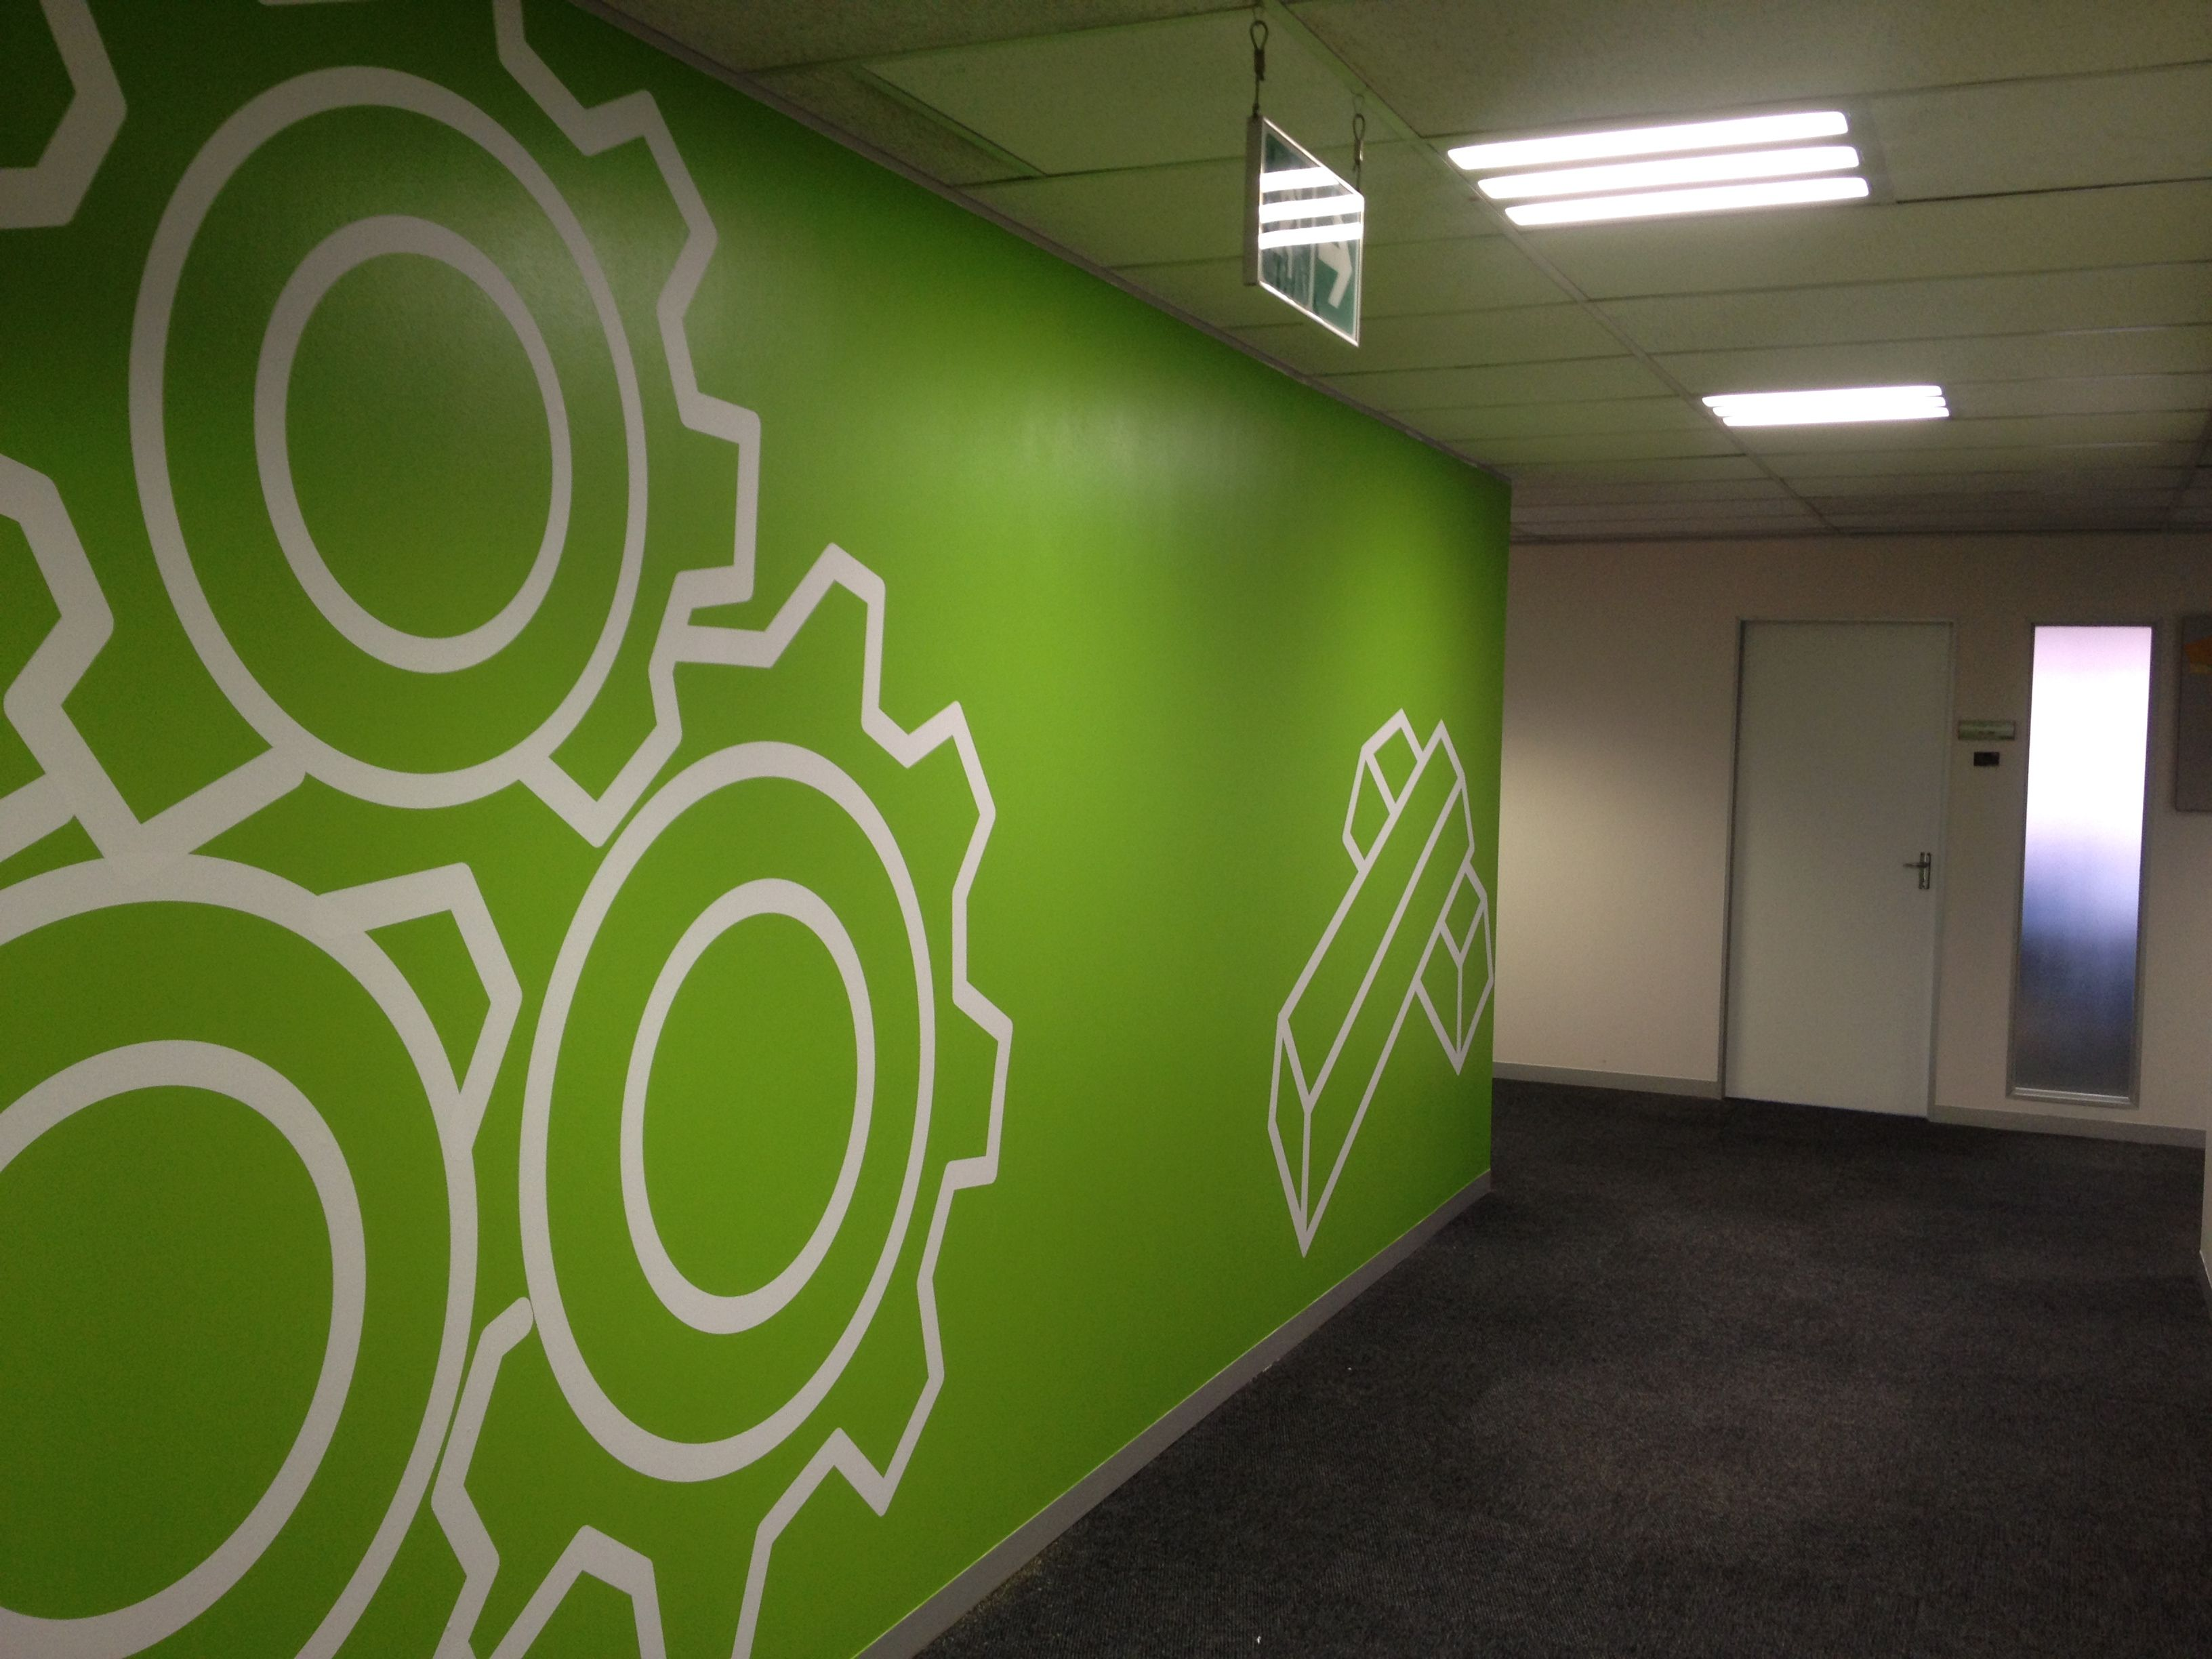 Good Office Artwork Ideas With Amazing Design Color Ideas Extraordinary Office Wall Art Desig Office Wall Graphics Office Wall Art Office Wall Design